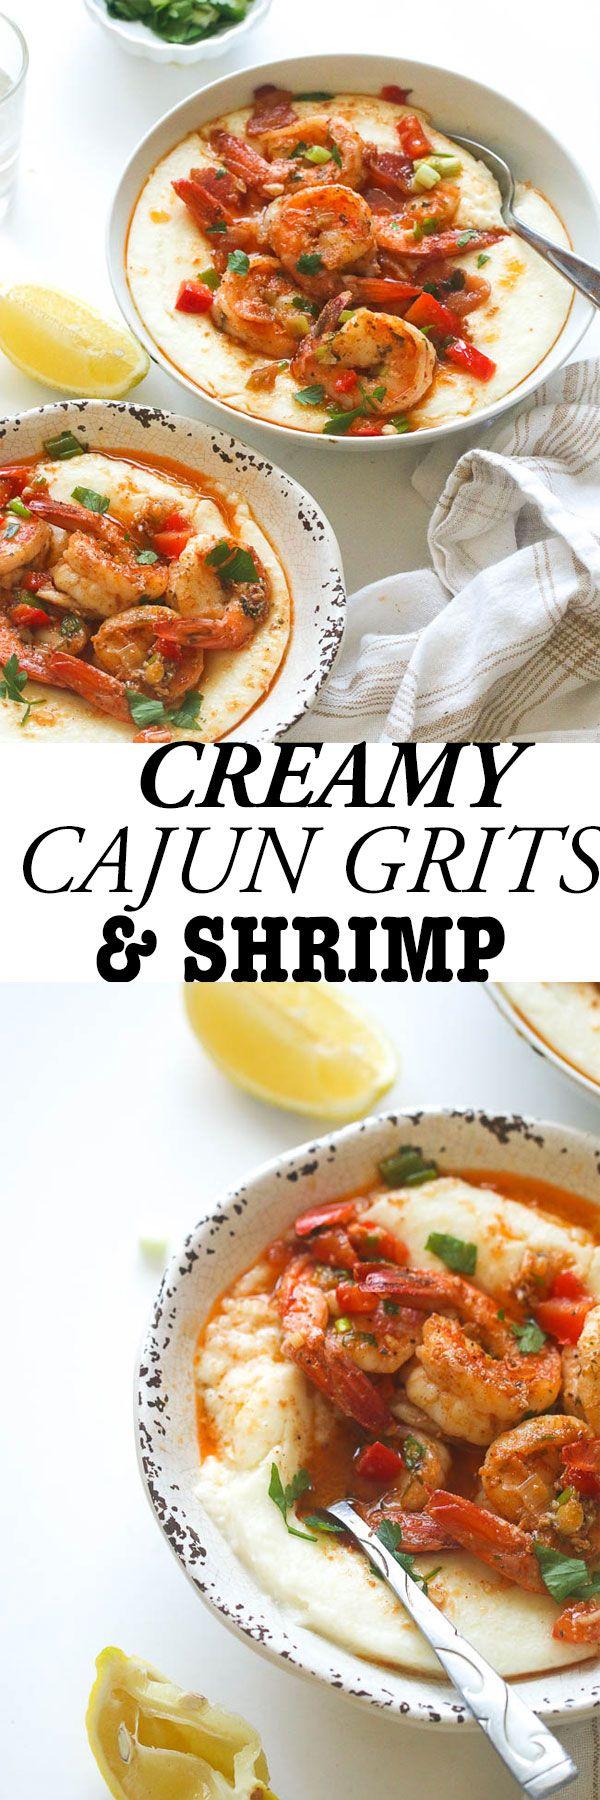 Cajun Shrimp And Grits